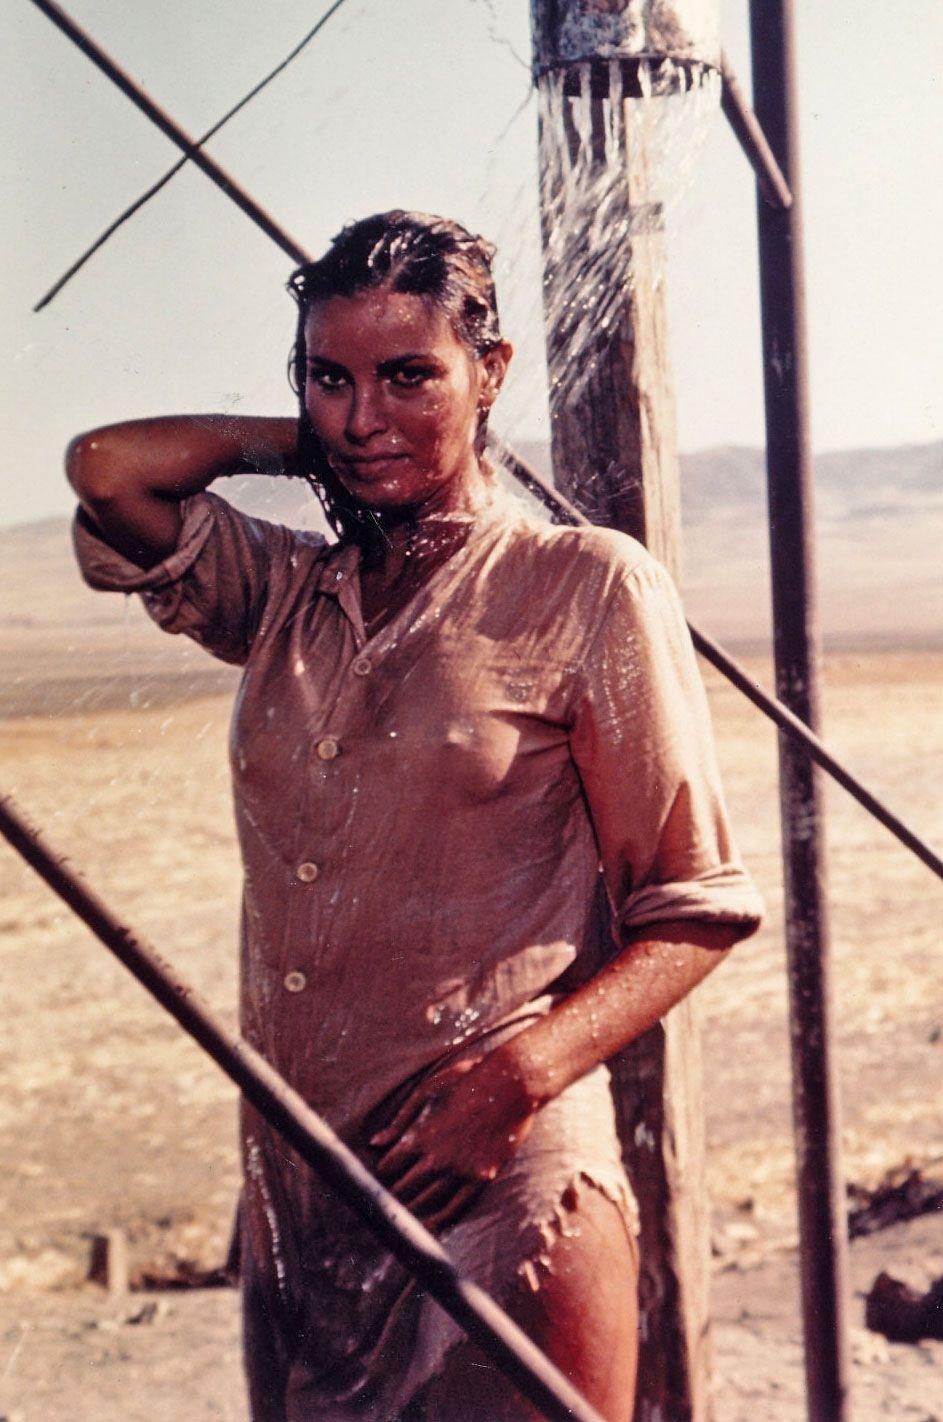 raquel welch taking an outdoor shower, 100 rifles (1969) | sexy